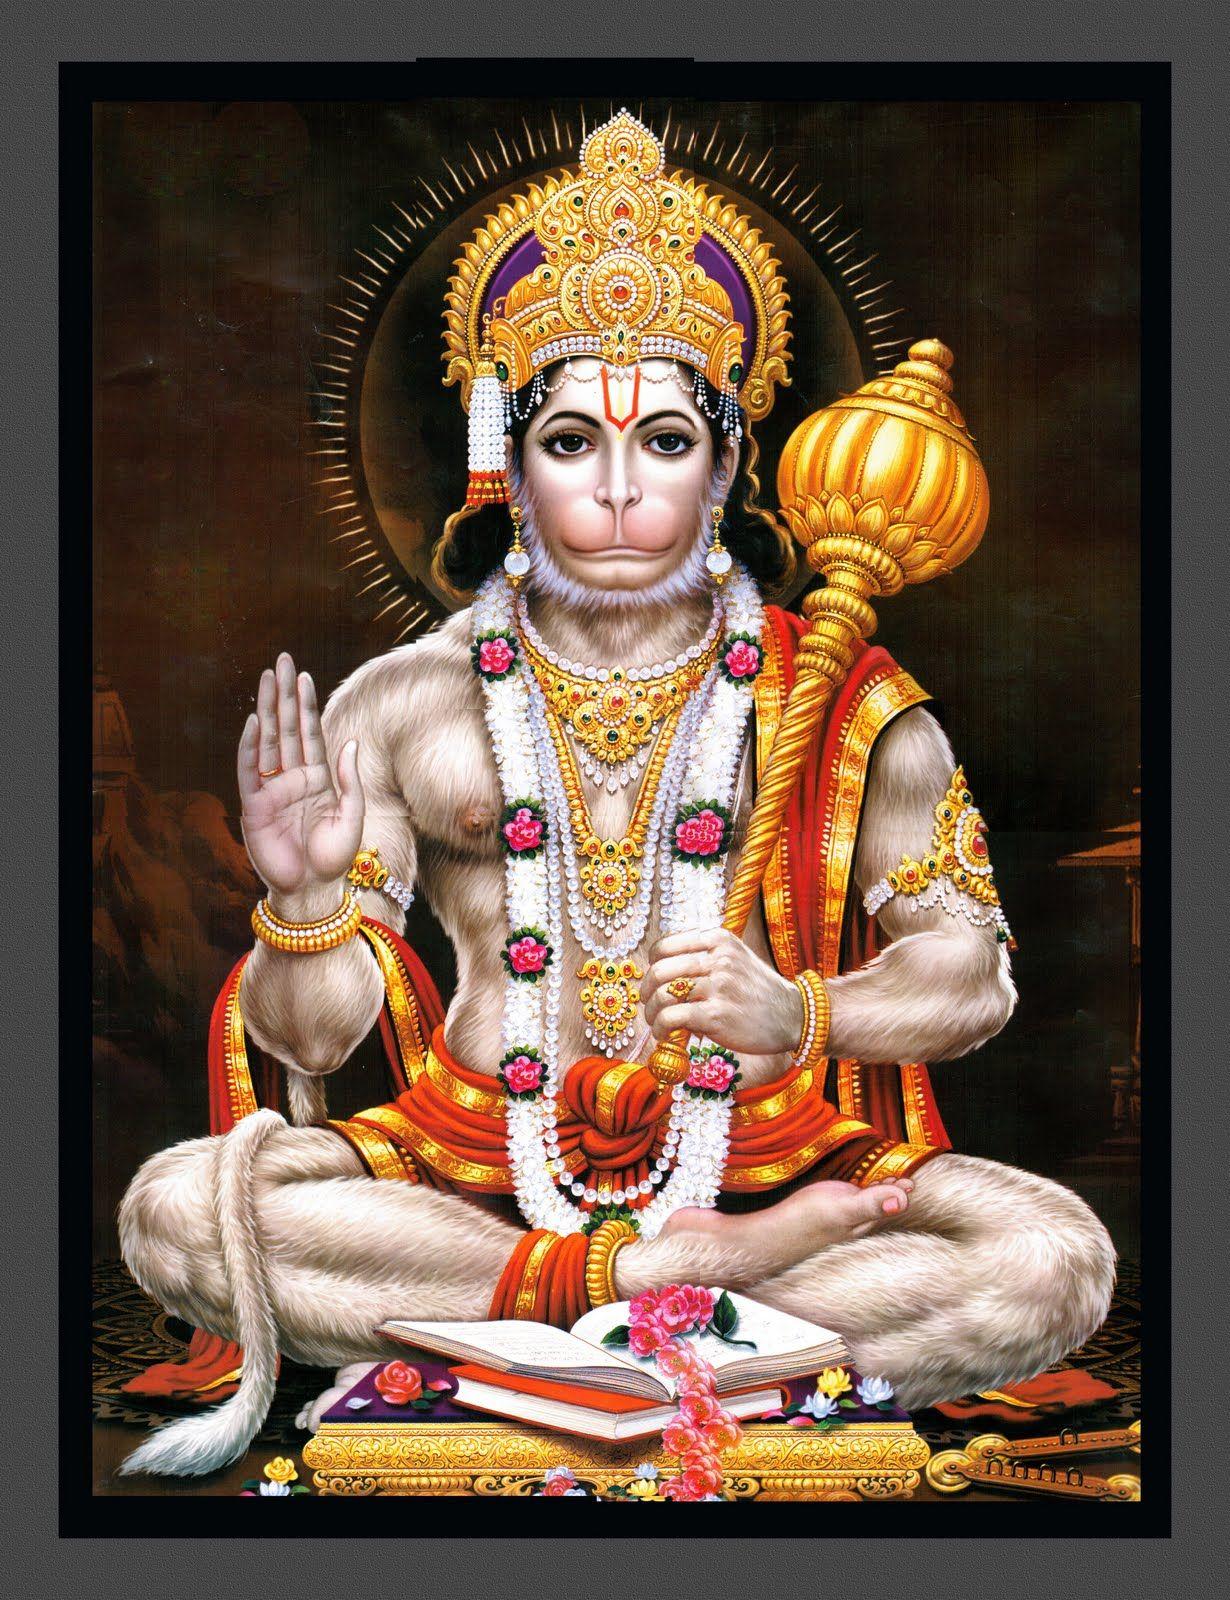 Lord Hanuman, symbol of strength, perseverance and devotion